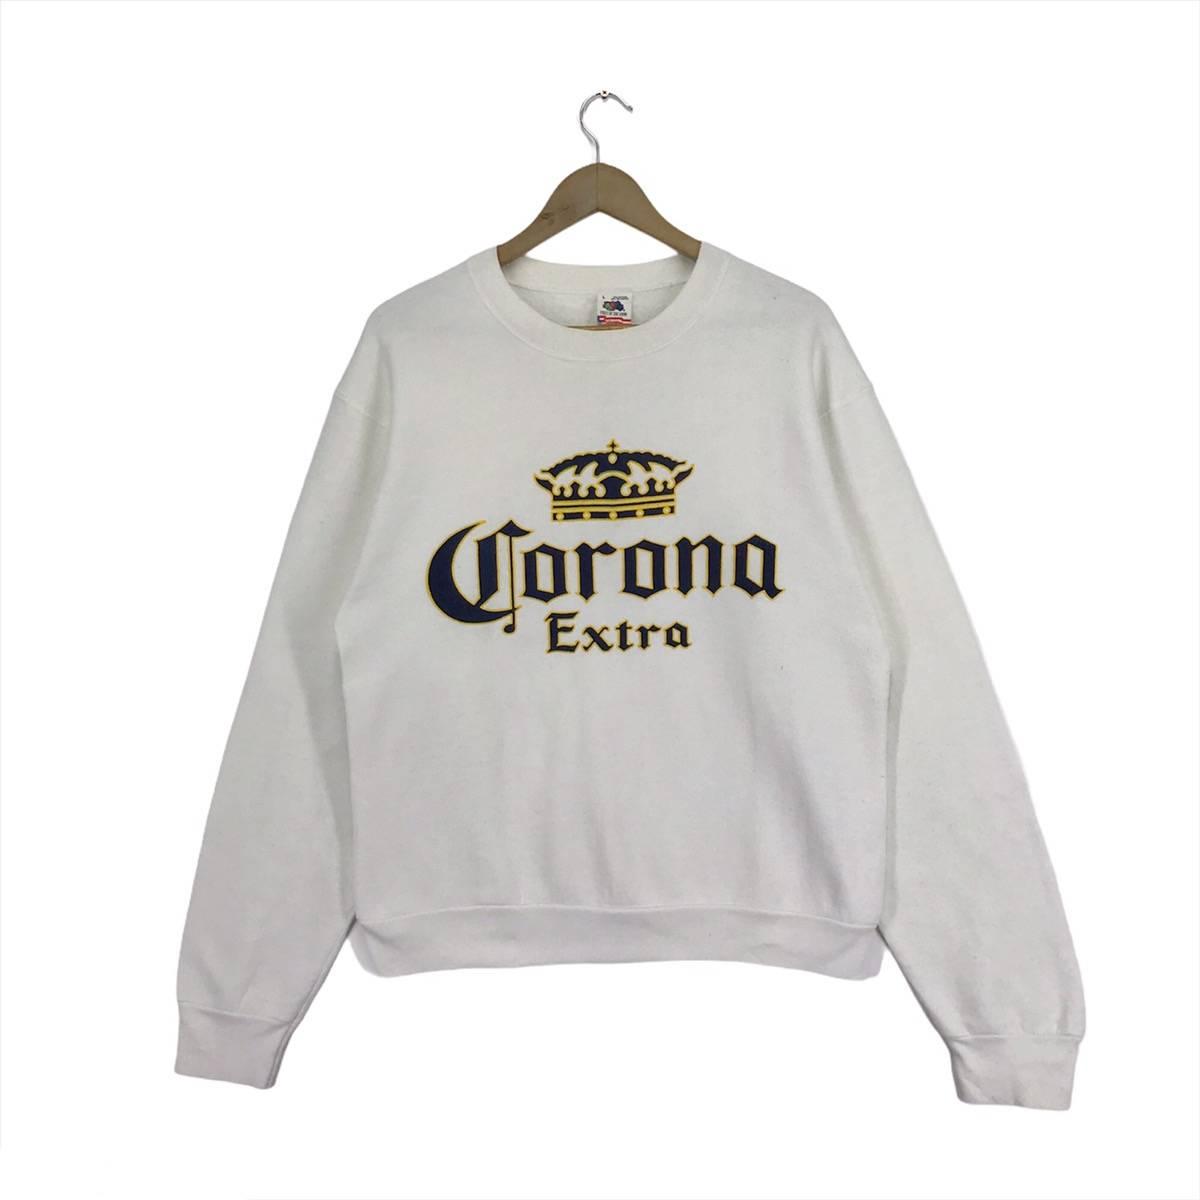 Corona Extra Vintage Label Sweatshirt